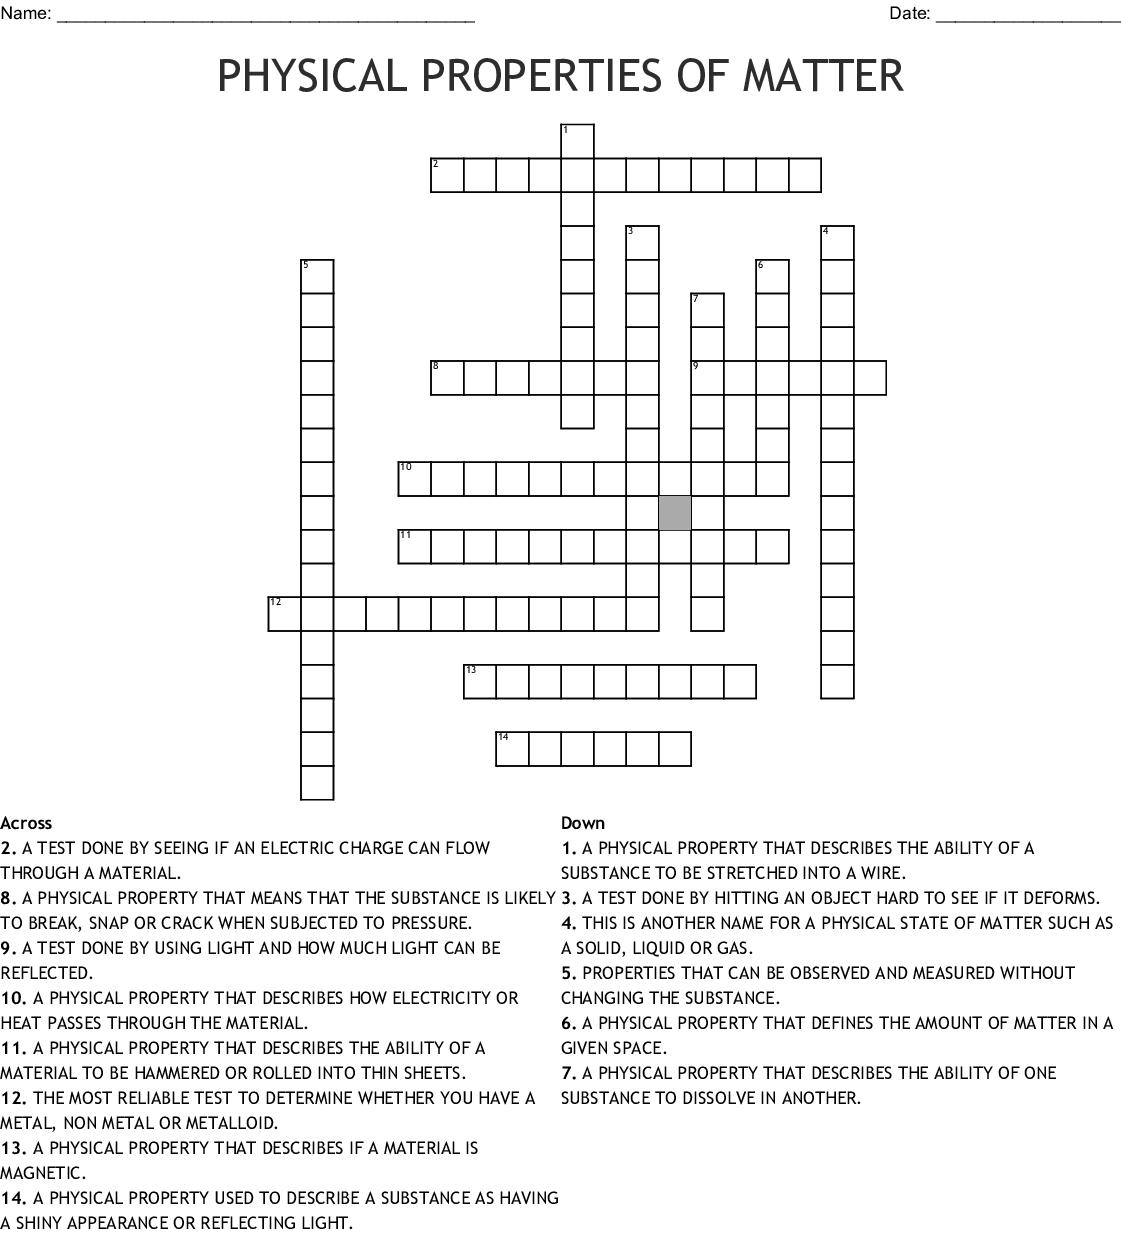 Physical Properties Of Matter Crossword